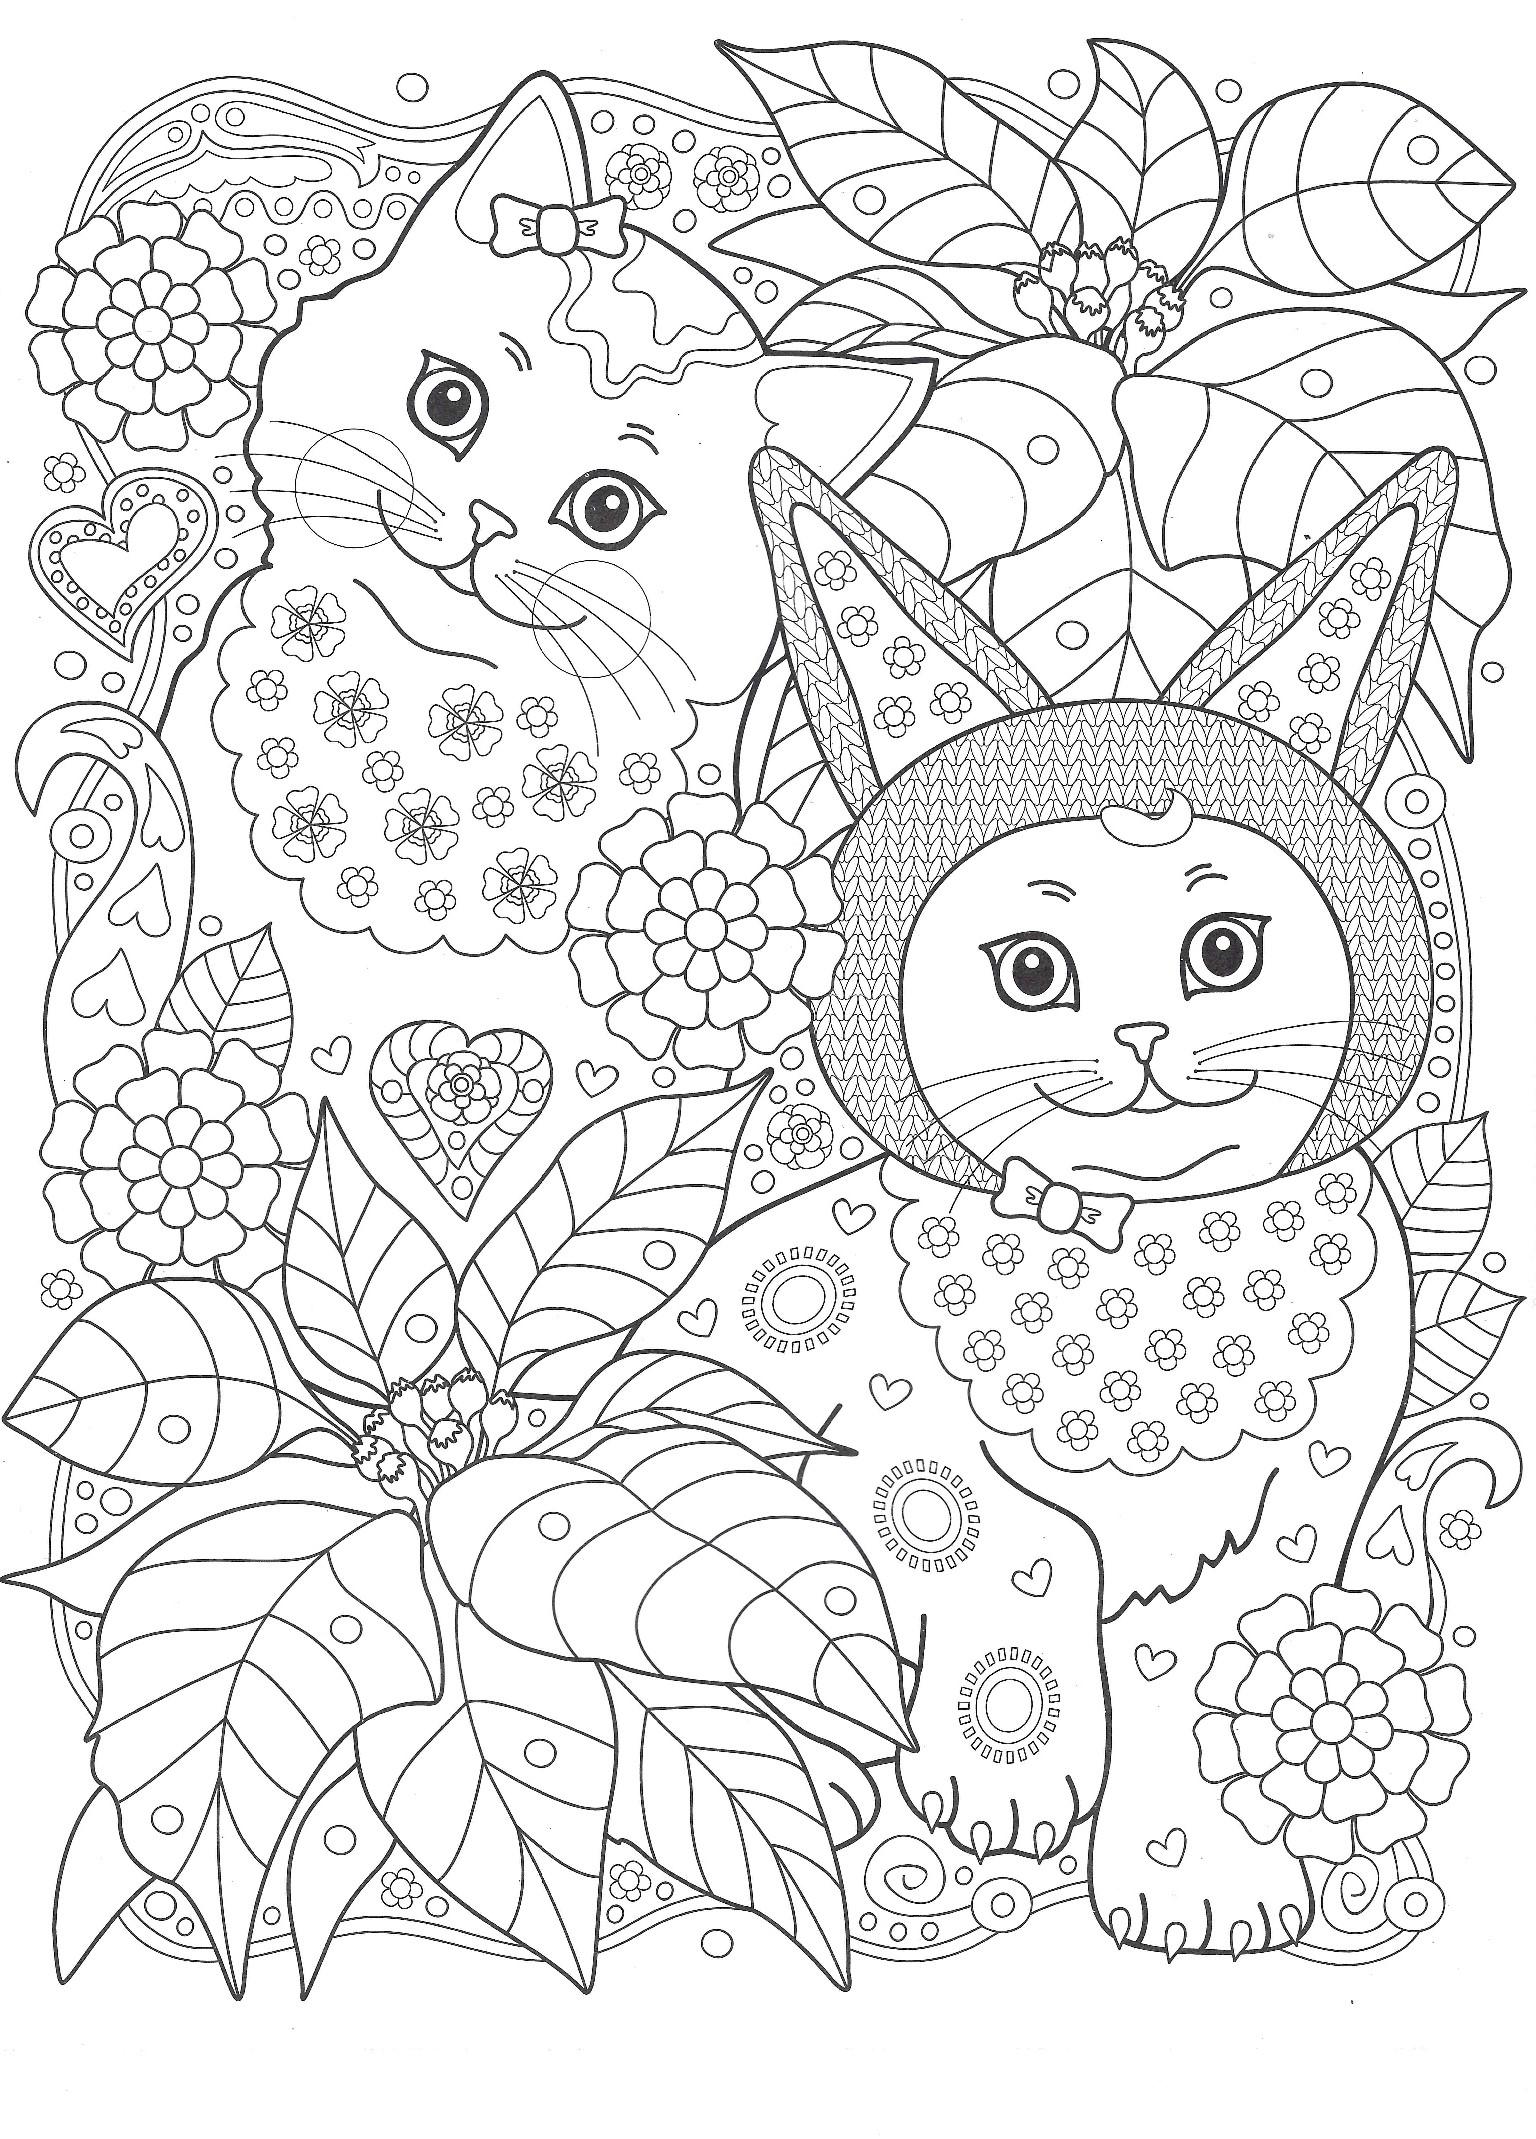 Раскраска Кошки в саду. Раскраска кошка, антистресс